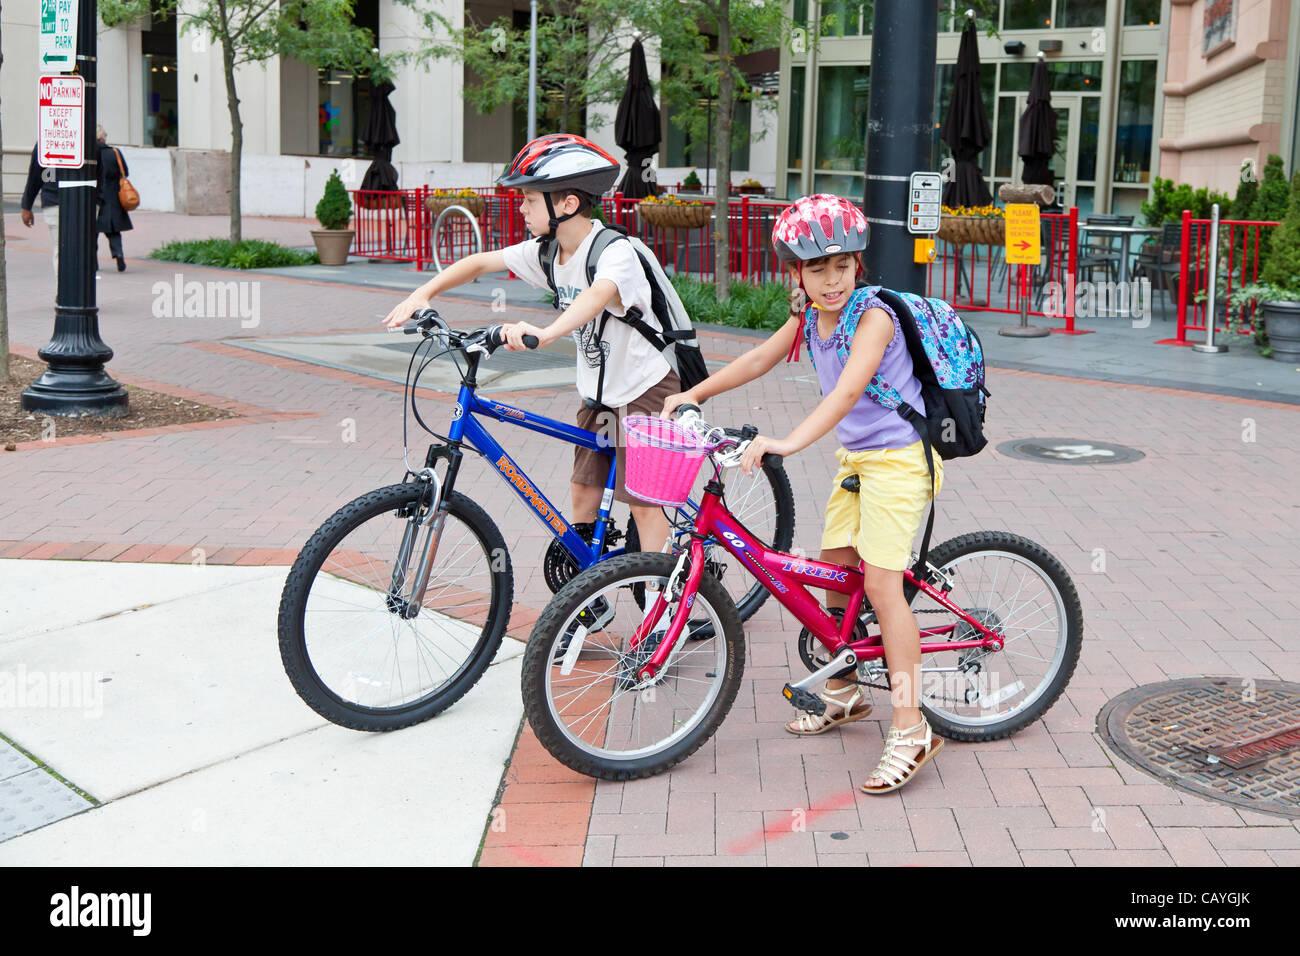 May 9, 2012 - Arlington, Virginia, USA - National Bike to School Day, Key School Escuela Key Elementary (Credit Stock Photo